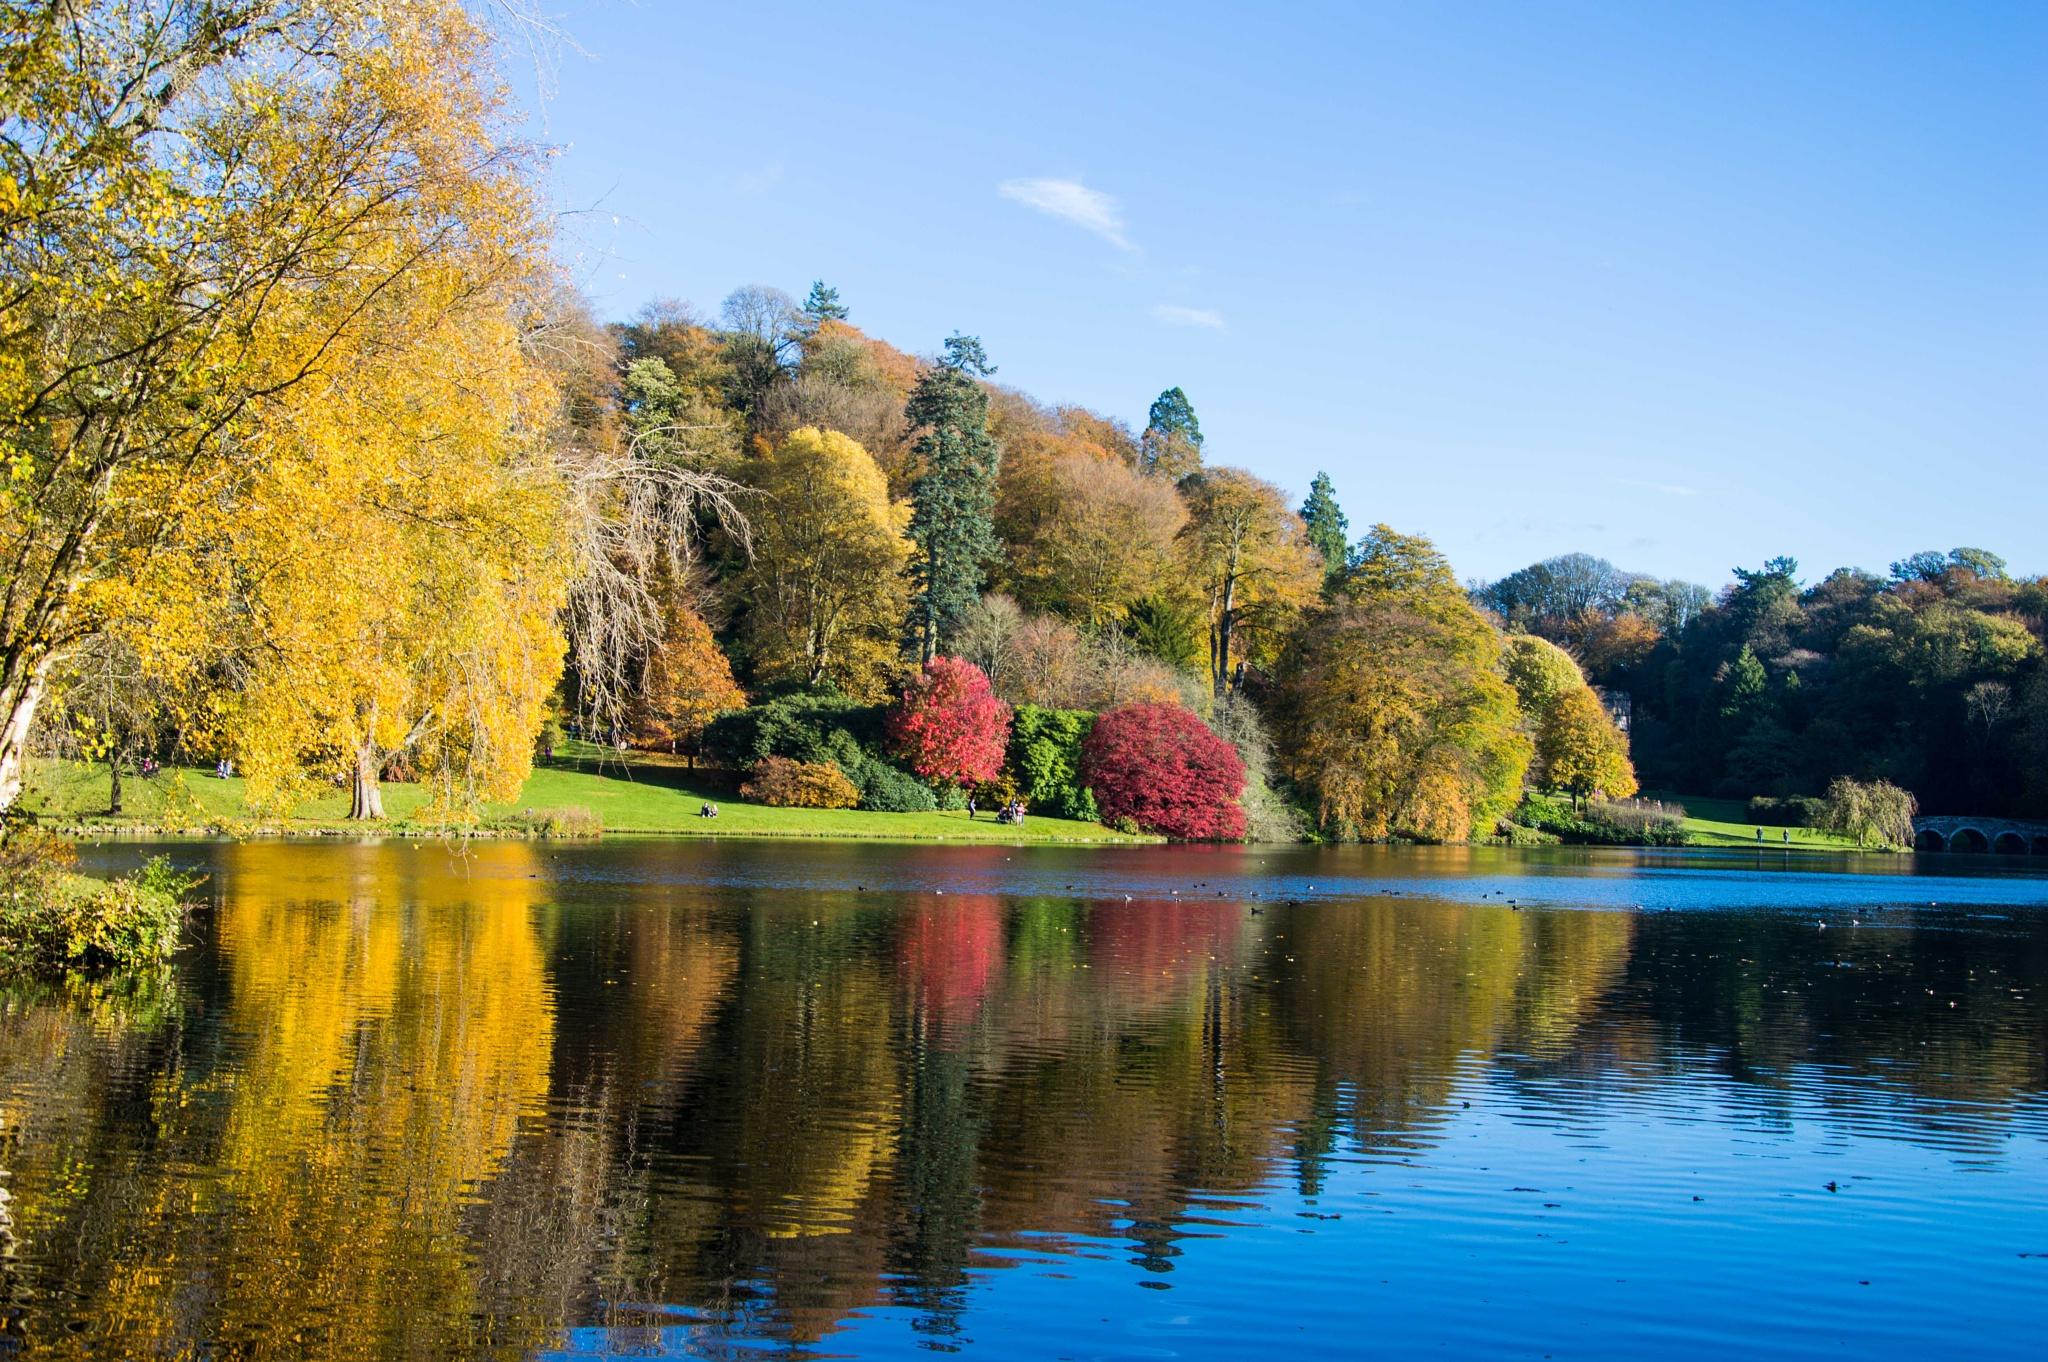 Autumn at Stourhead 2014 by Steve Billett